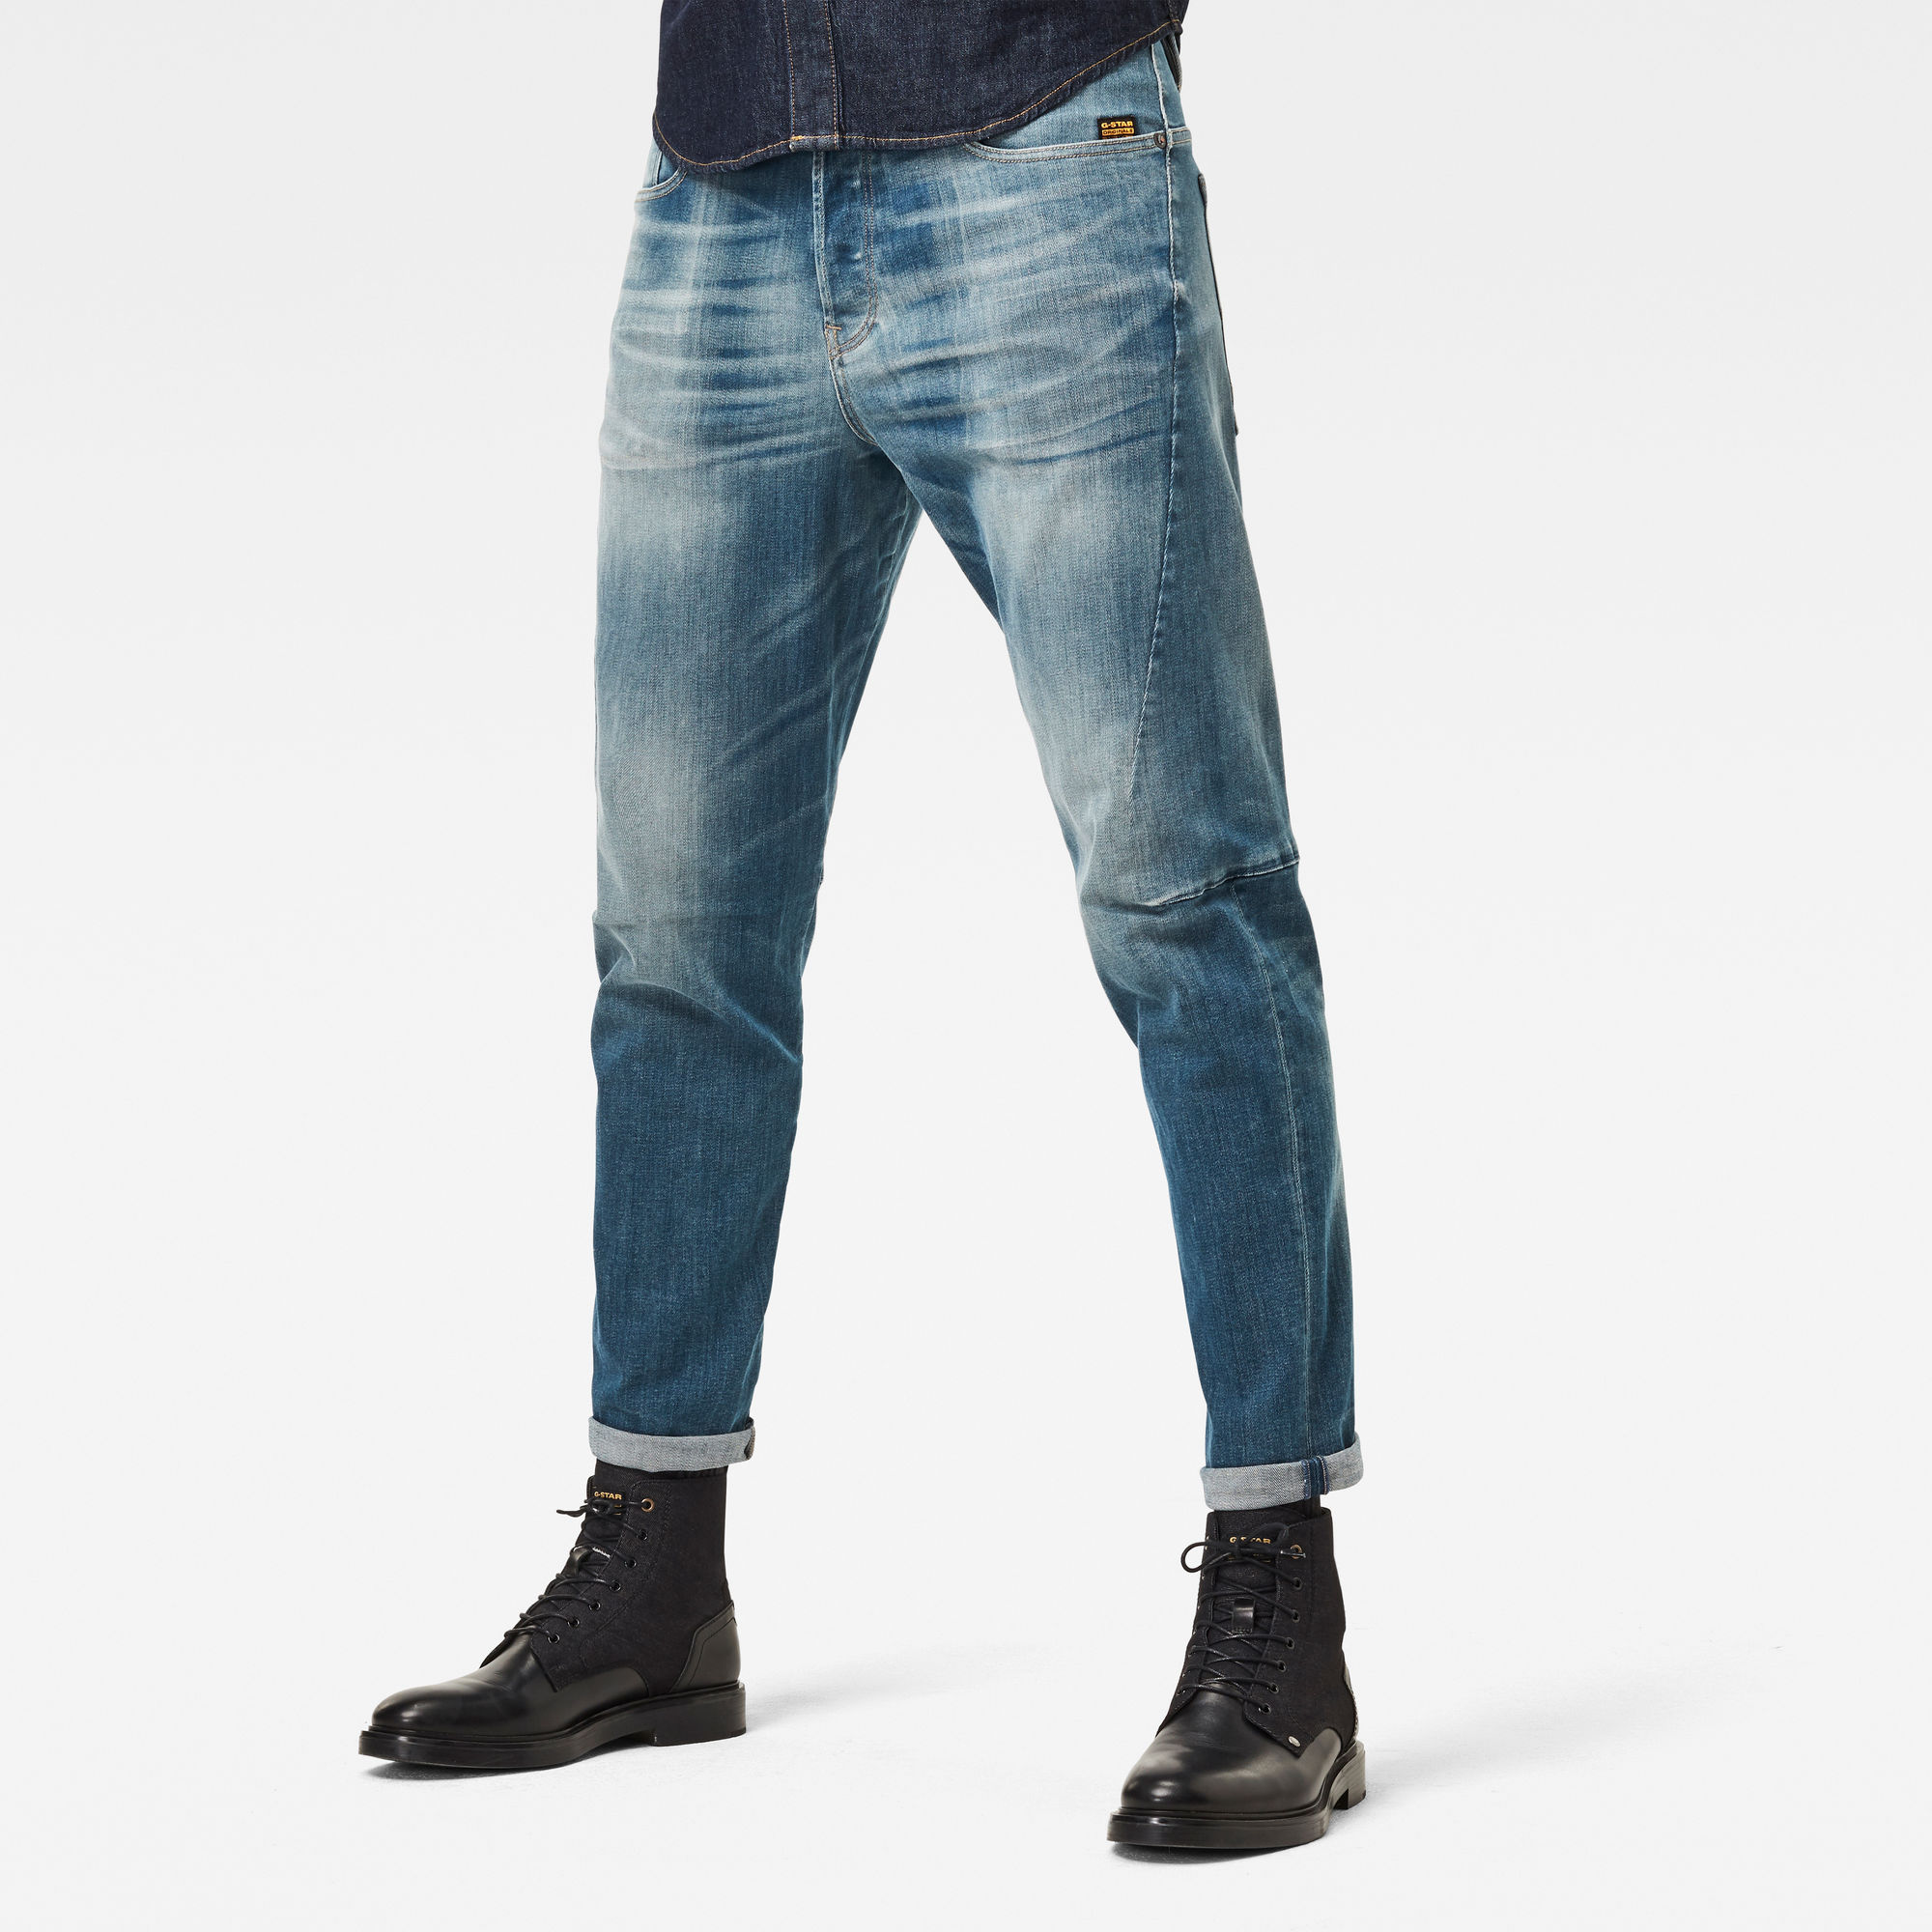 G-Star RAW Heren Scutar 3D Tapered Jeans Blauw